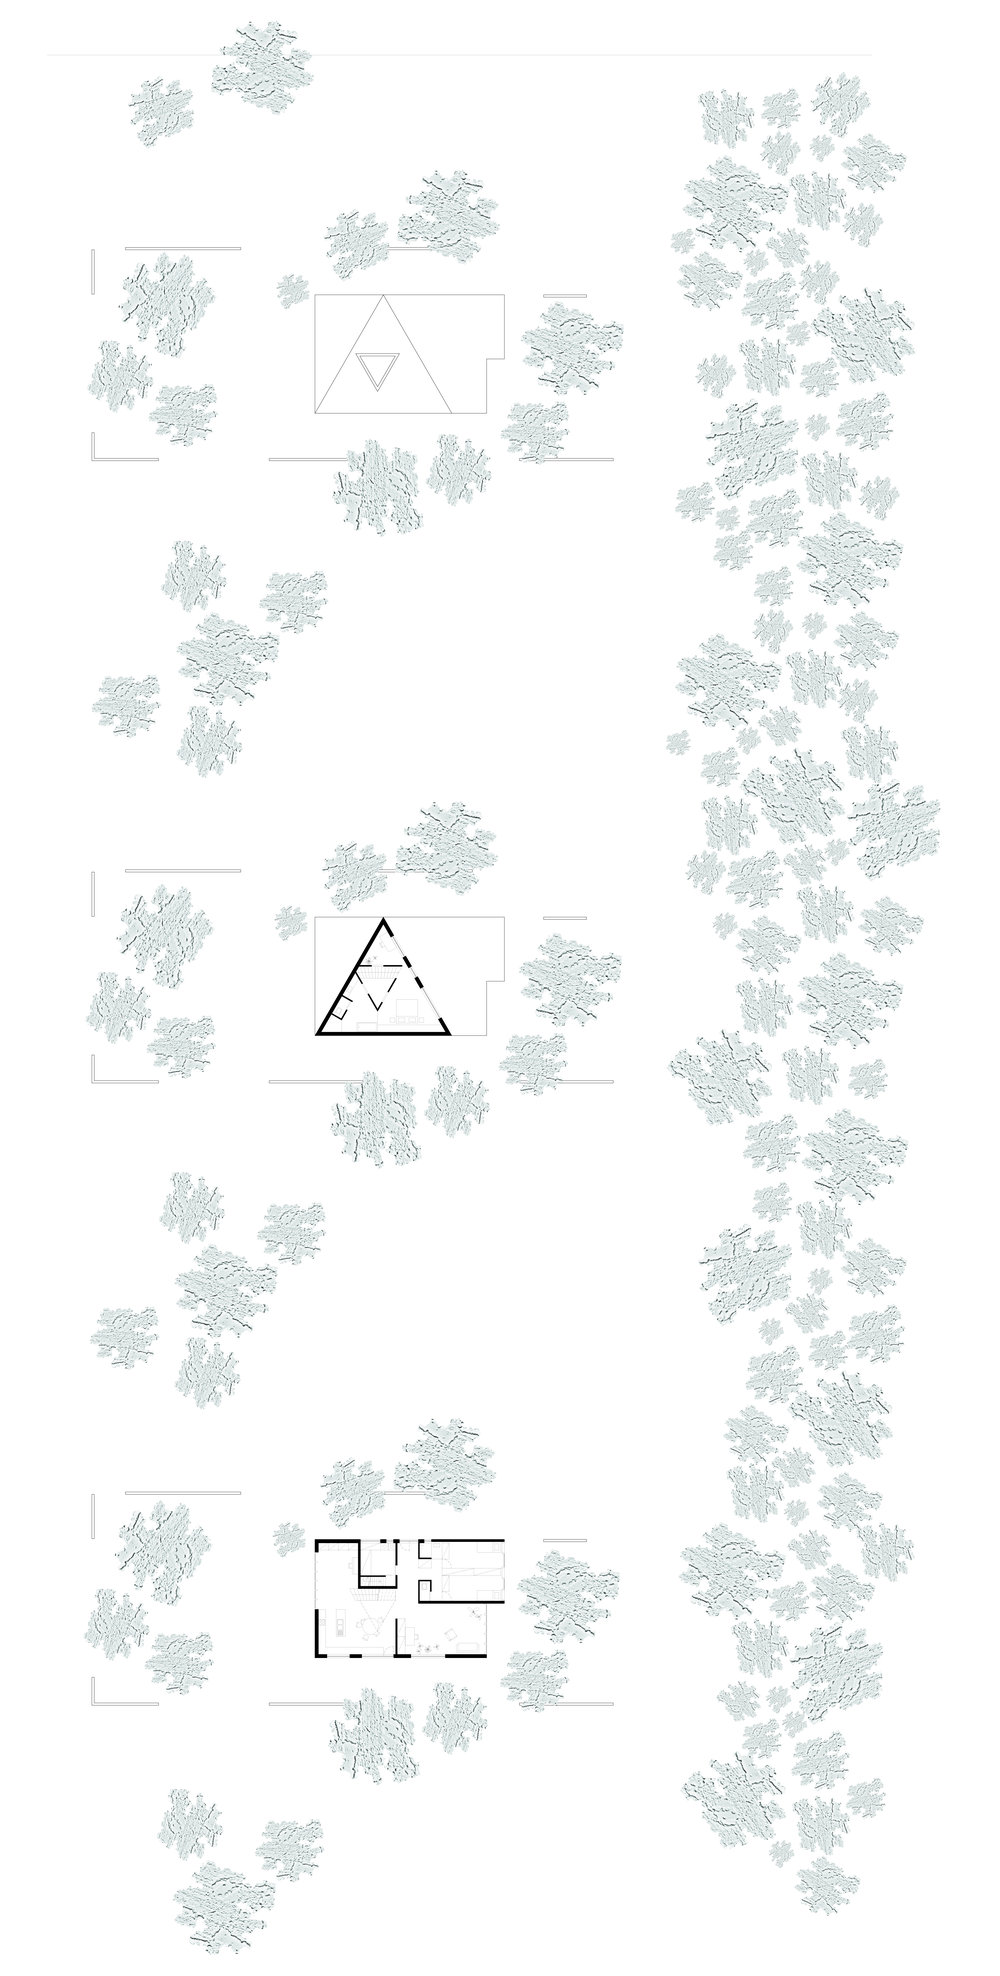 190107 horizontal plans e 6.jpg